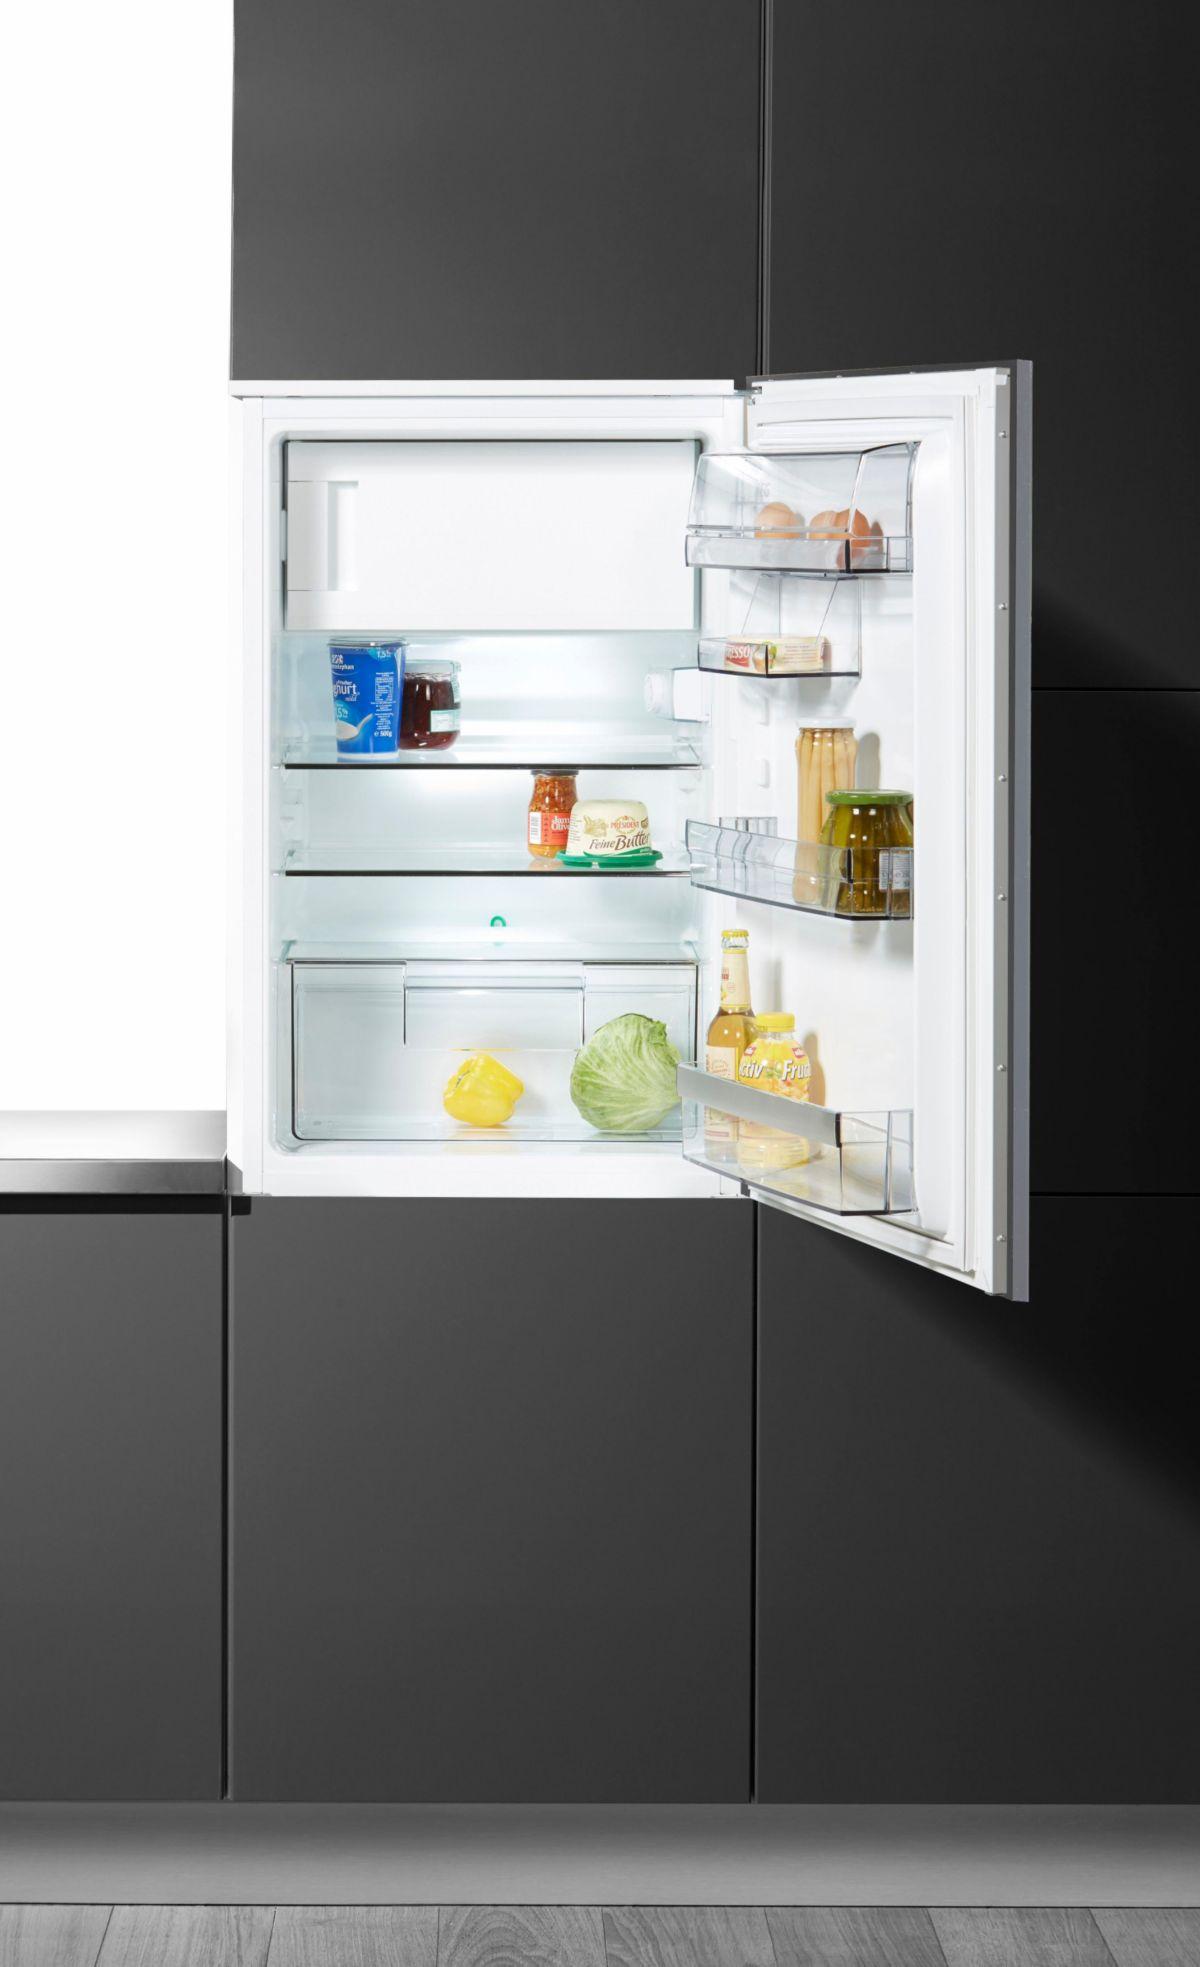 AEG Einbau-Kühlschrank SANTO SFB58831AE, A+++, ...